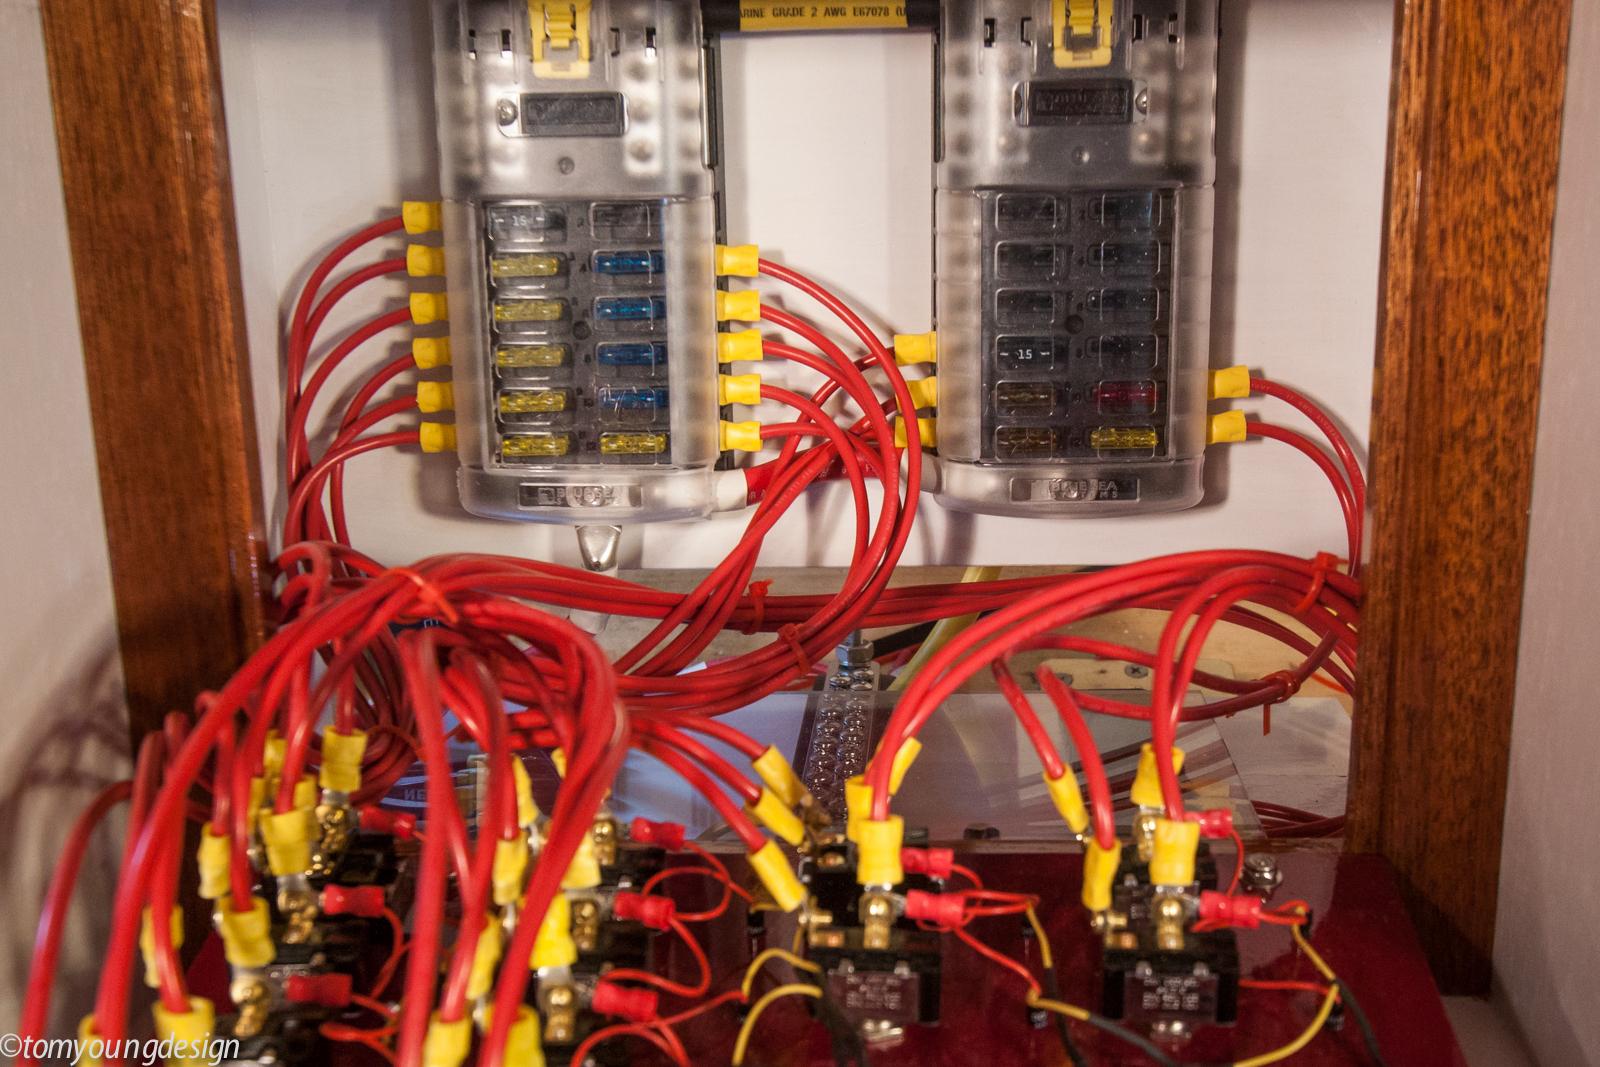 Switch panel wiring 2.jpg